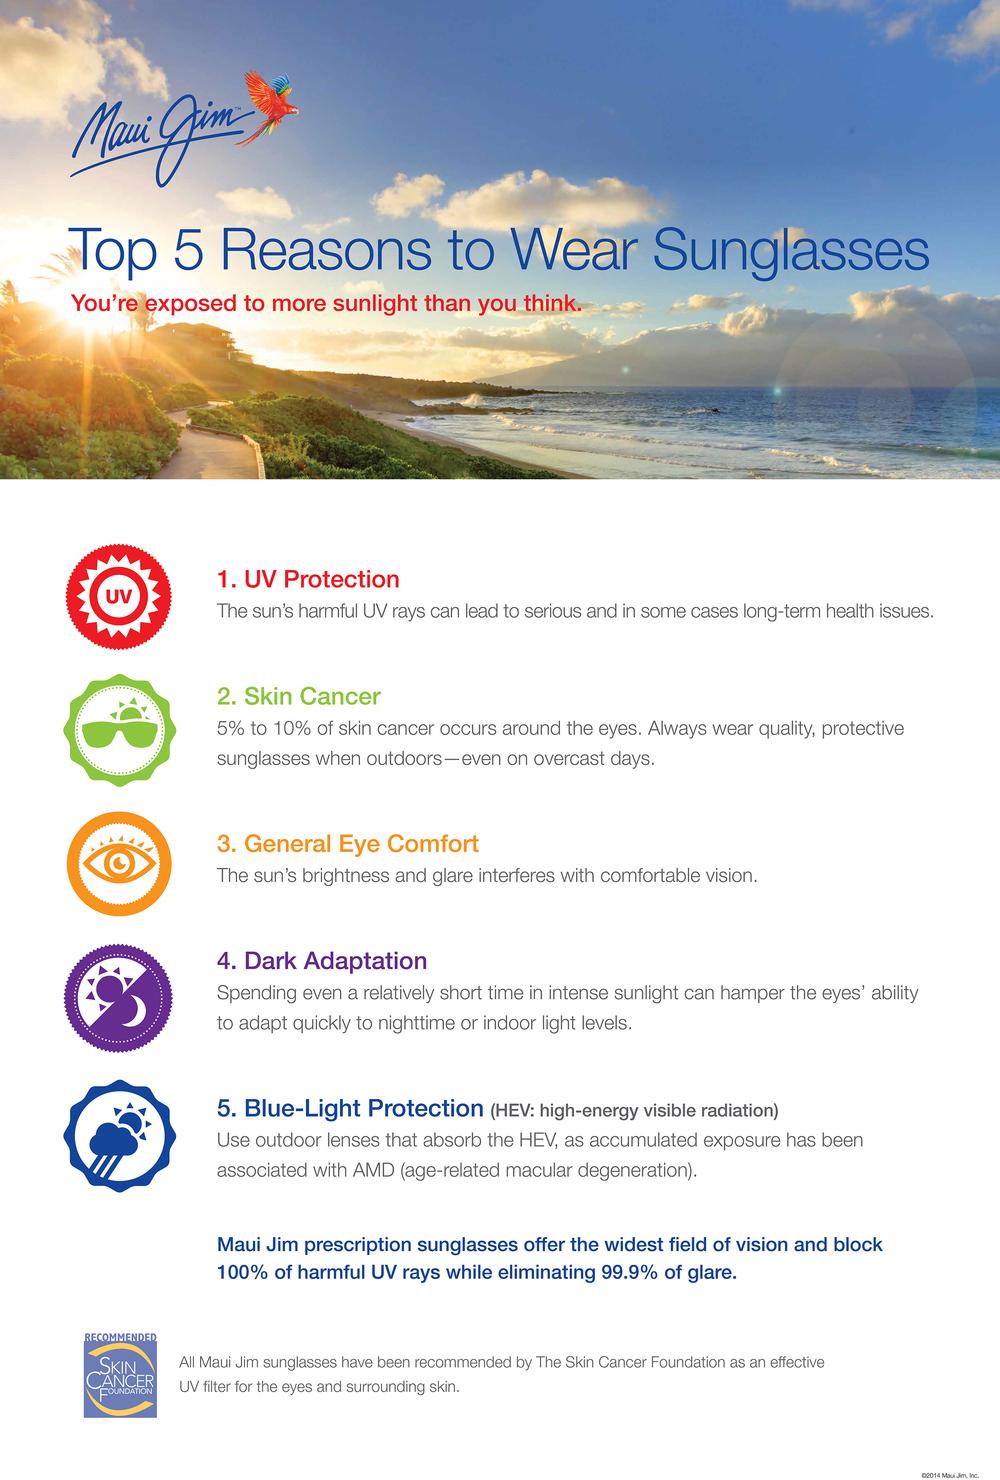 Top 5 Reasons to Wear Sunglasses.jpg